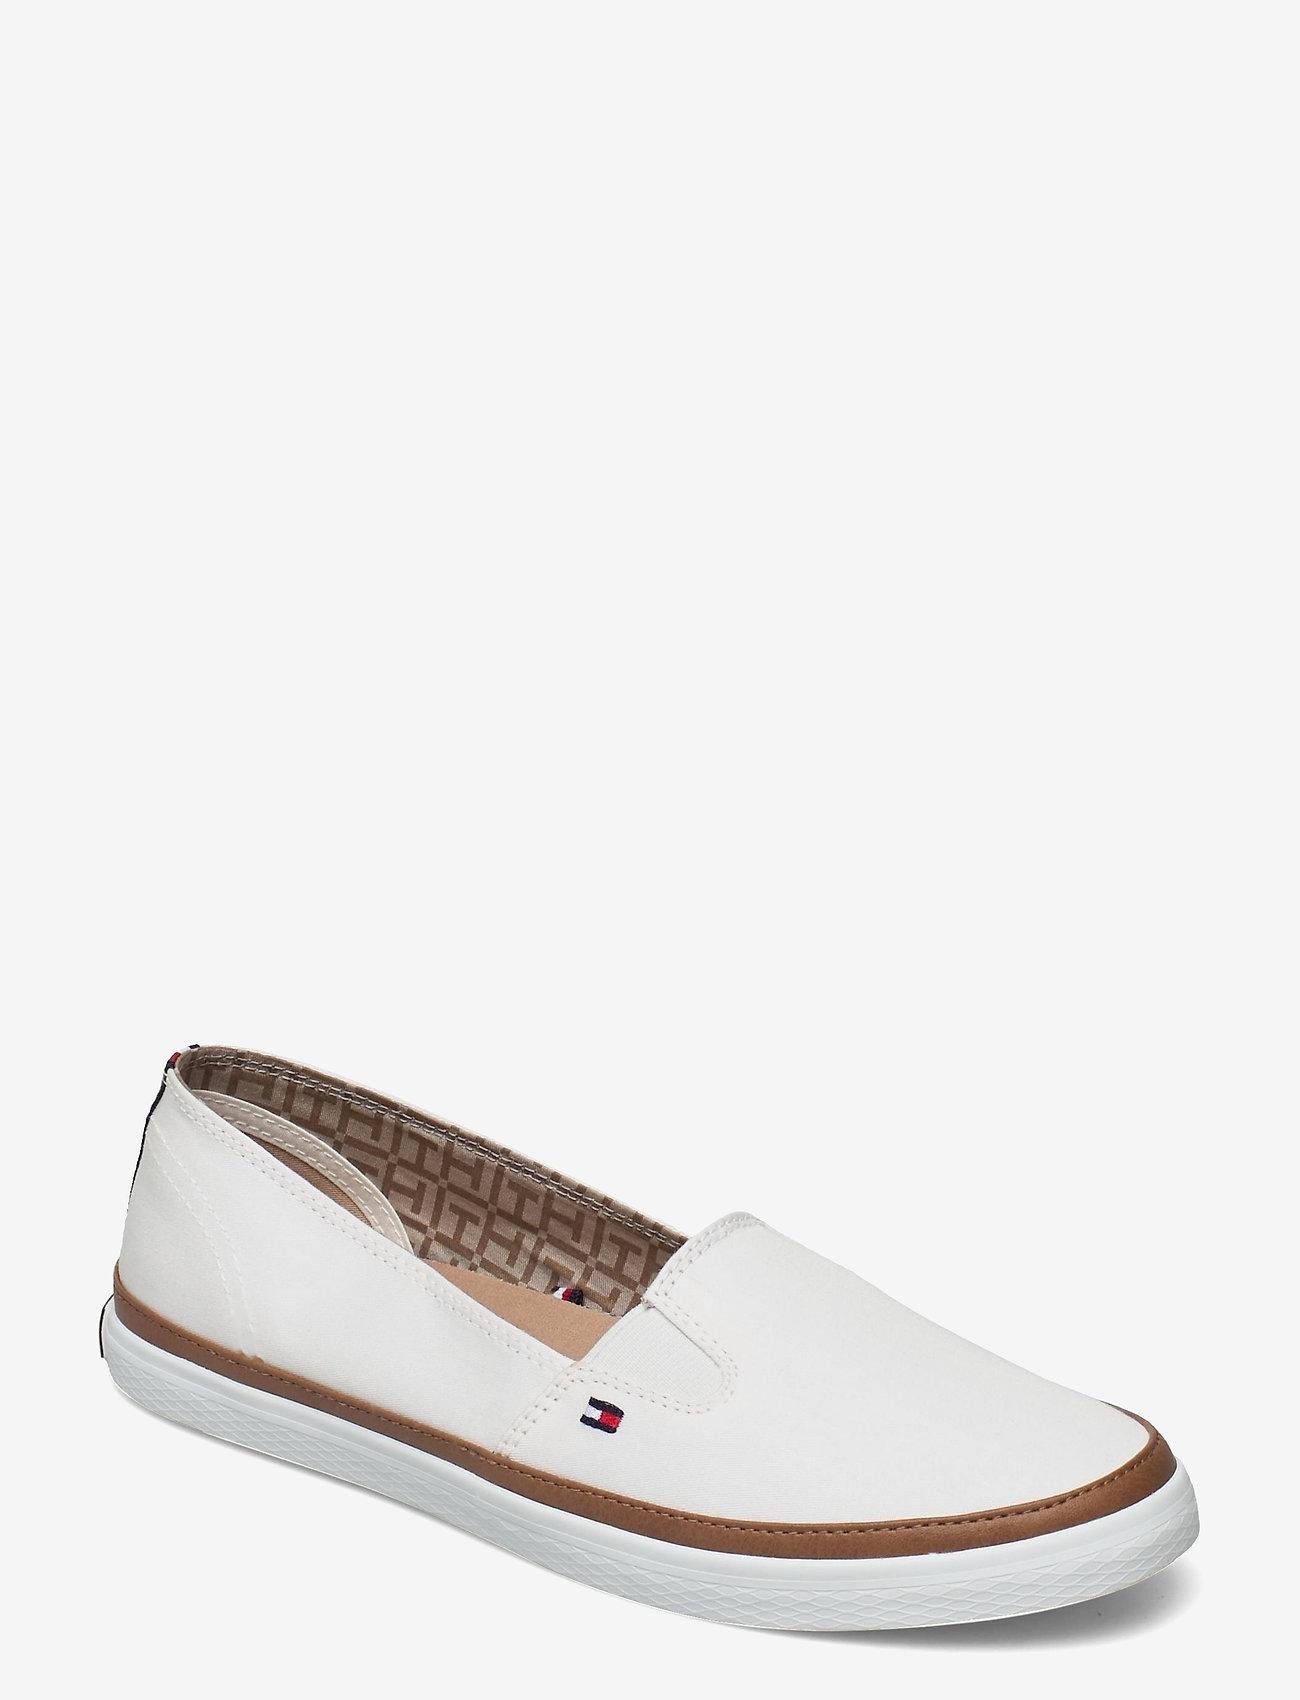 Tommy Hilfiger - ICONIC KESHA SLIP ON - loafers - whisper white - 0